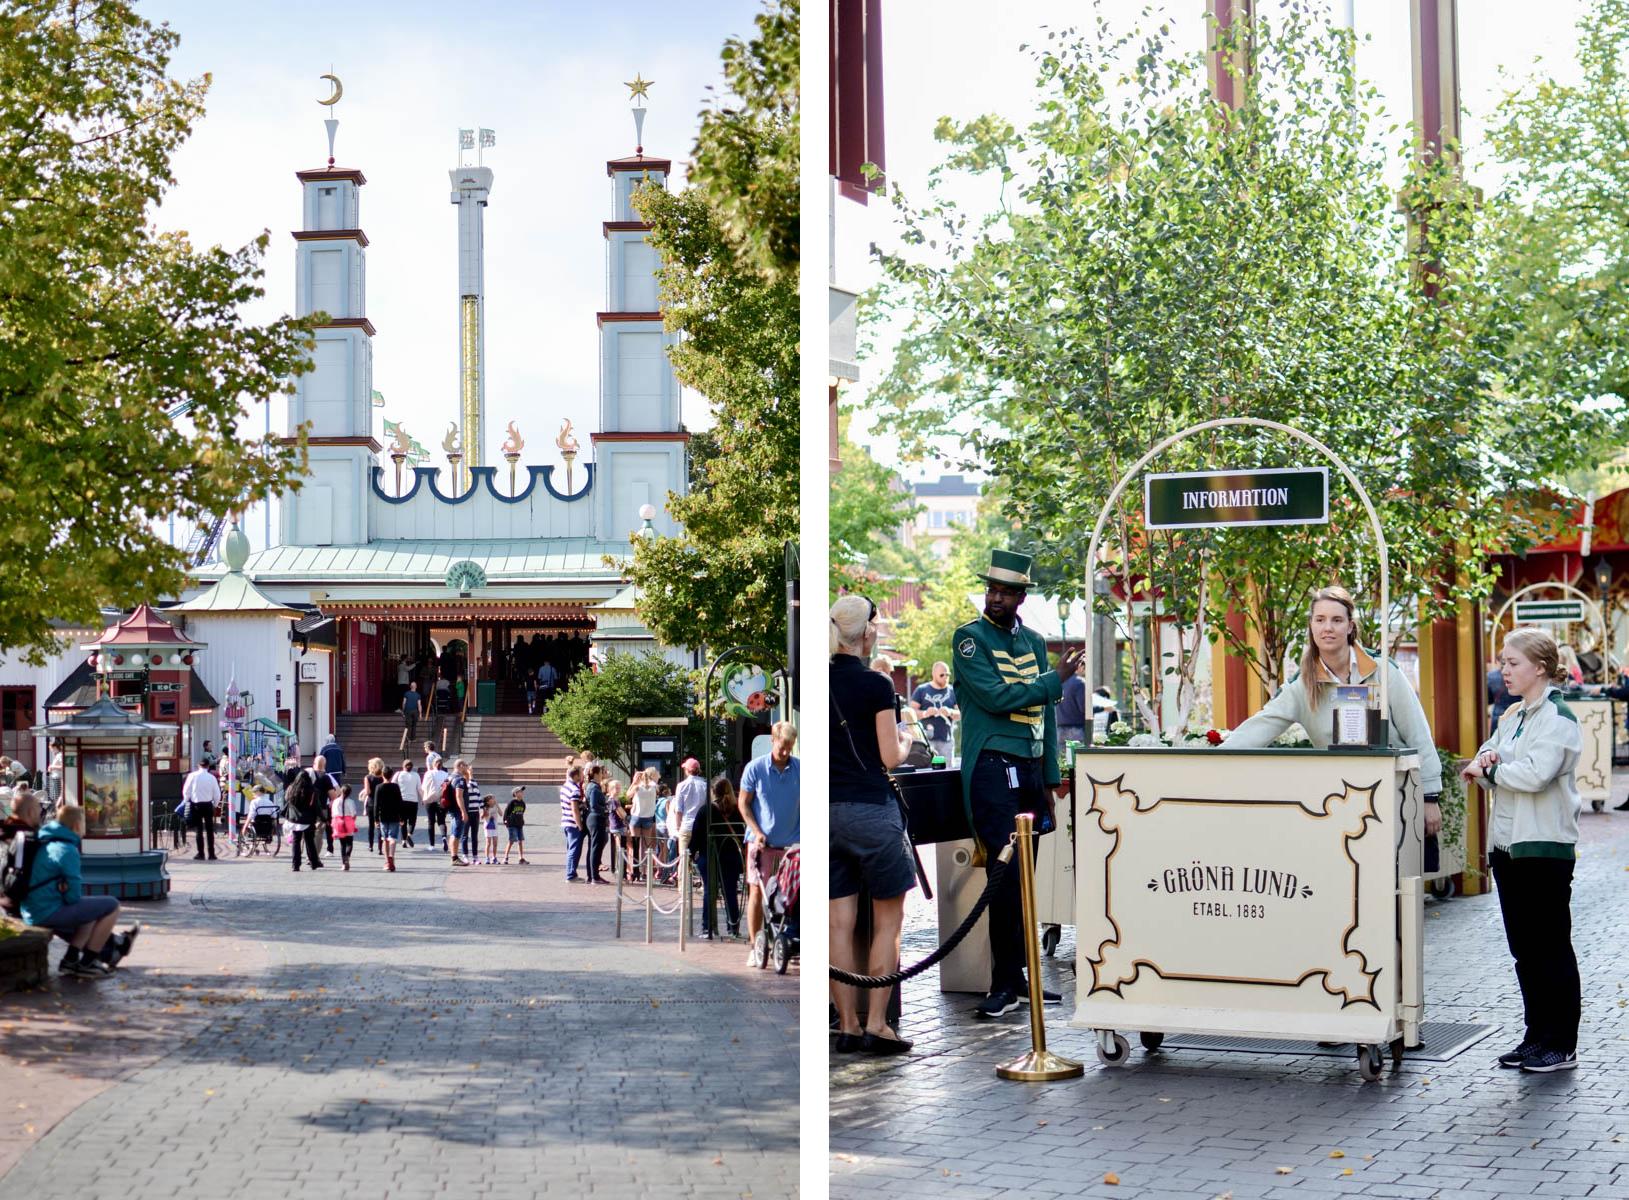 7-tourism-stockholm-grona-lund-1-i-scandinavia-standard-2